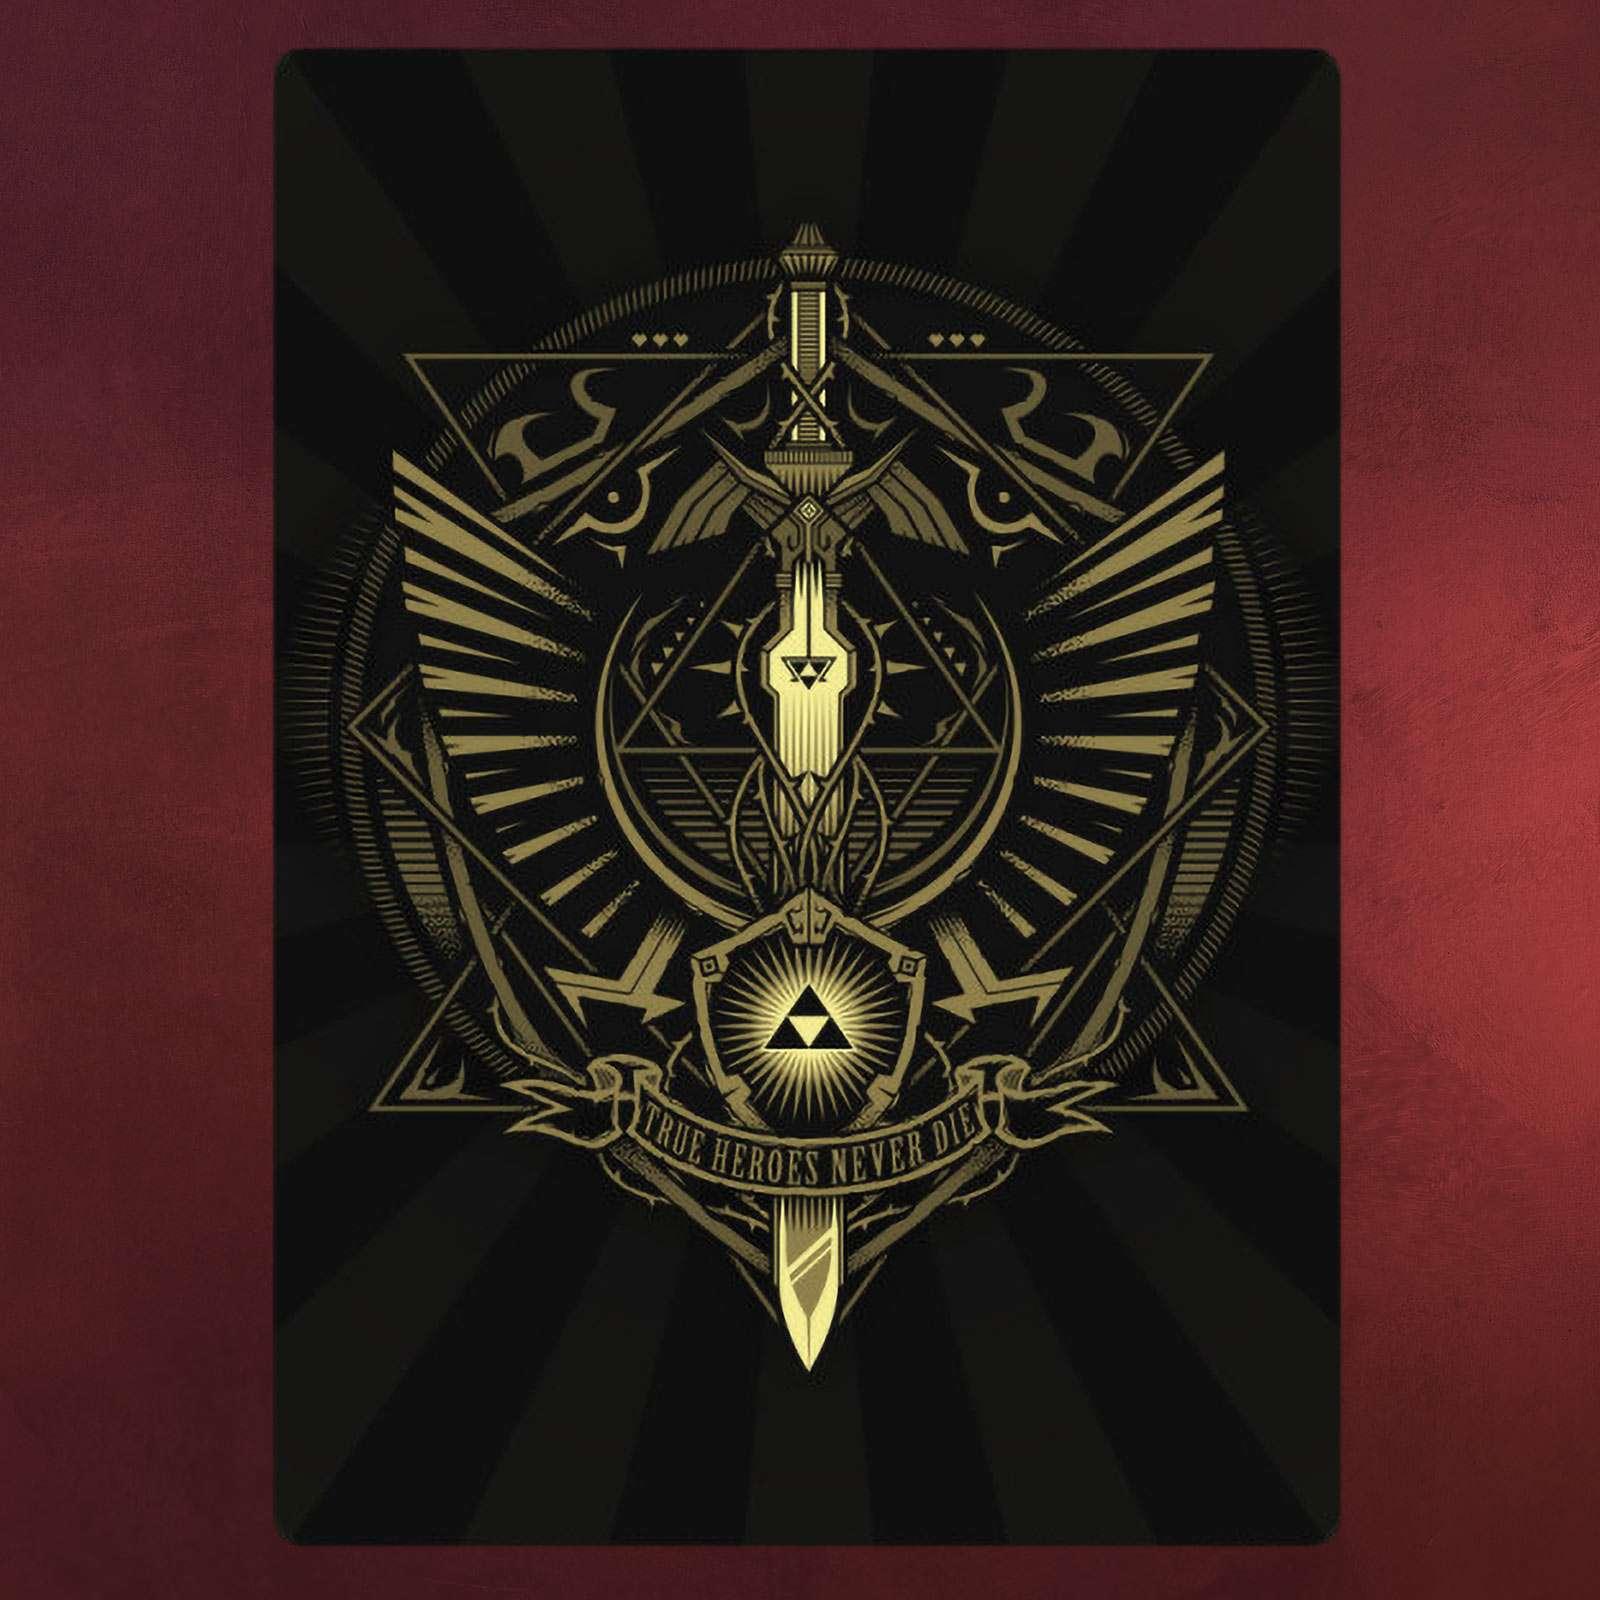 Hyrule Heroes Metall Poster für Zelda Fans | Elbenwald